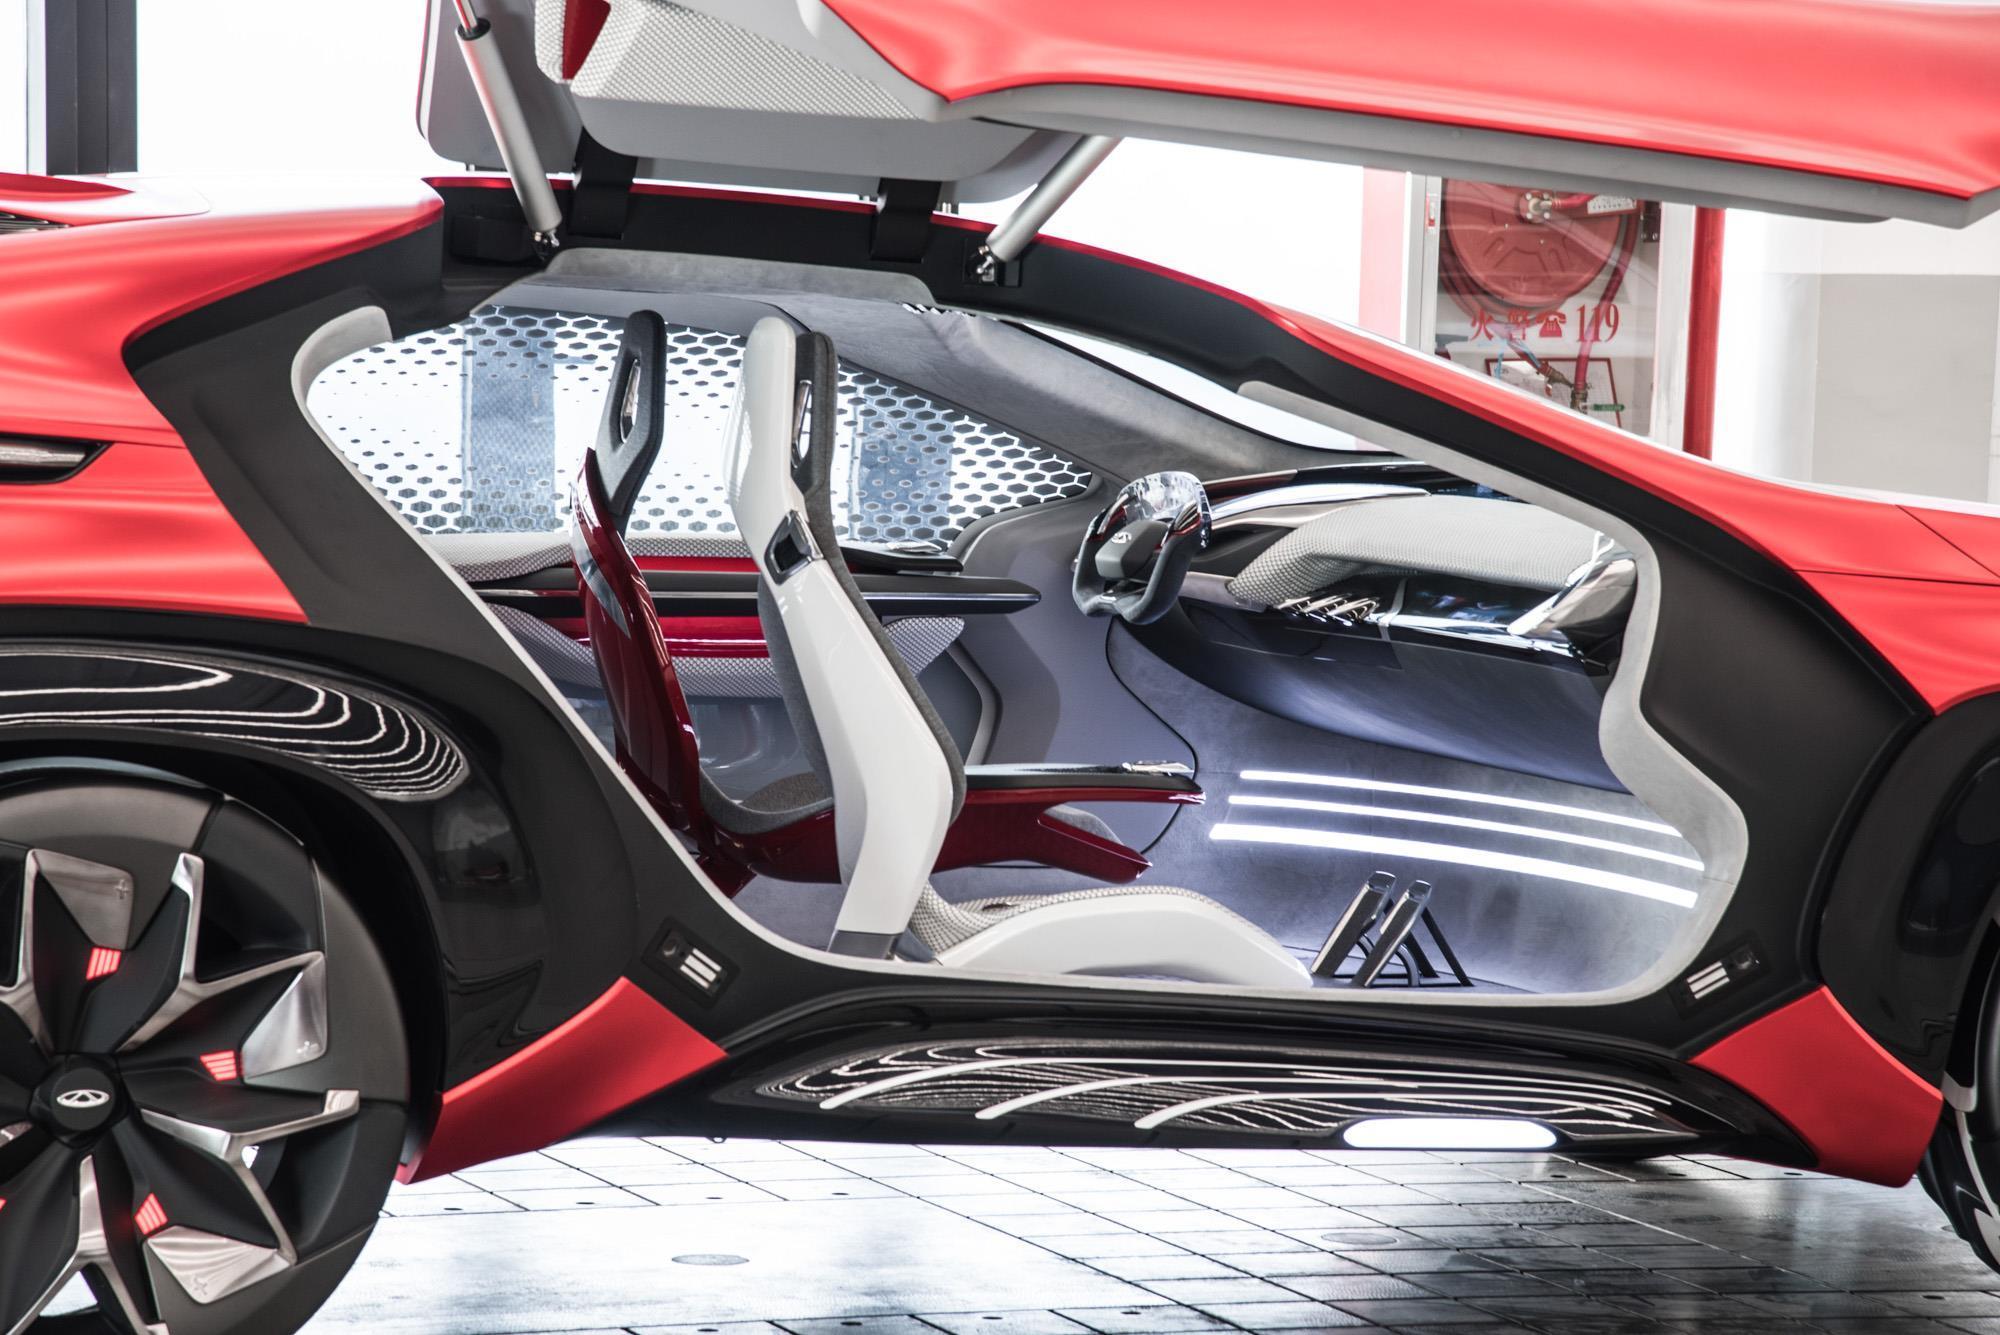 Chery FV2030 concept teased ahead of Beijing motor show